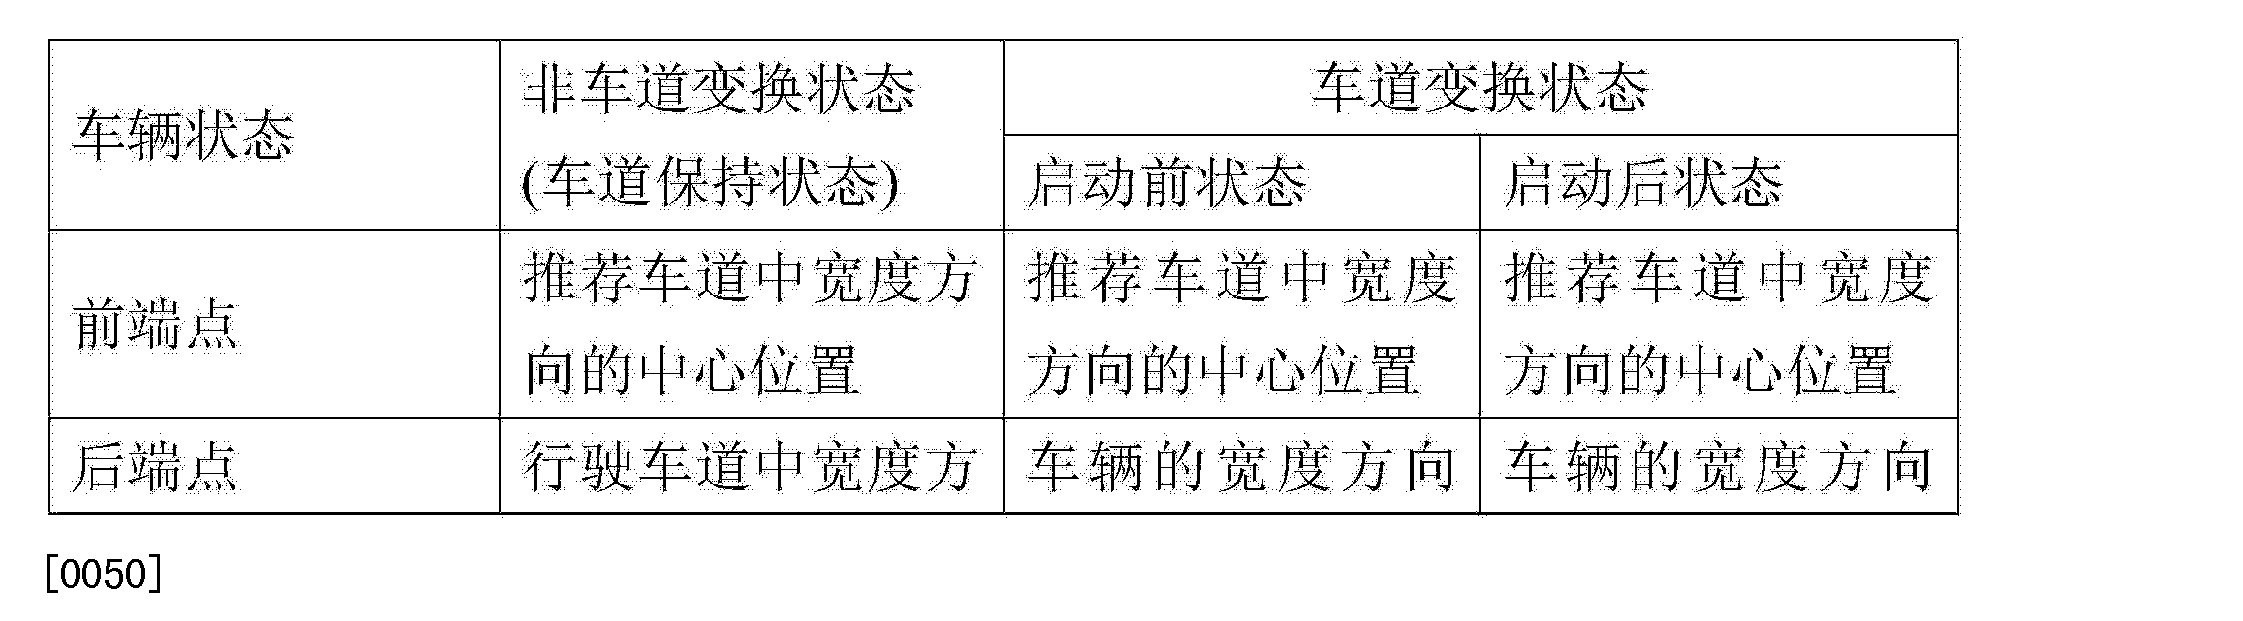 Figure CN103842776AD00101